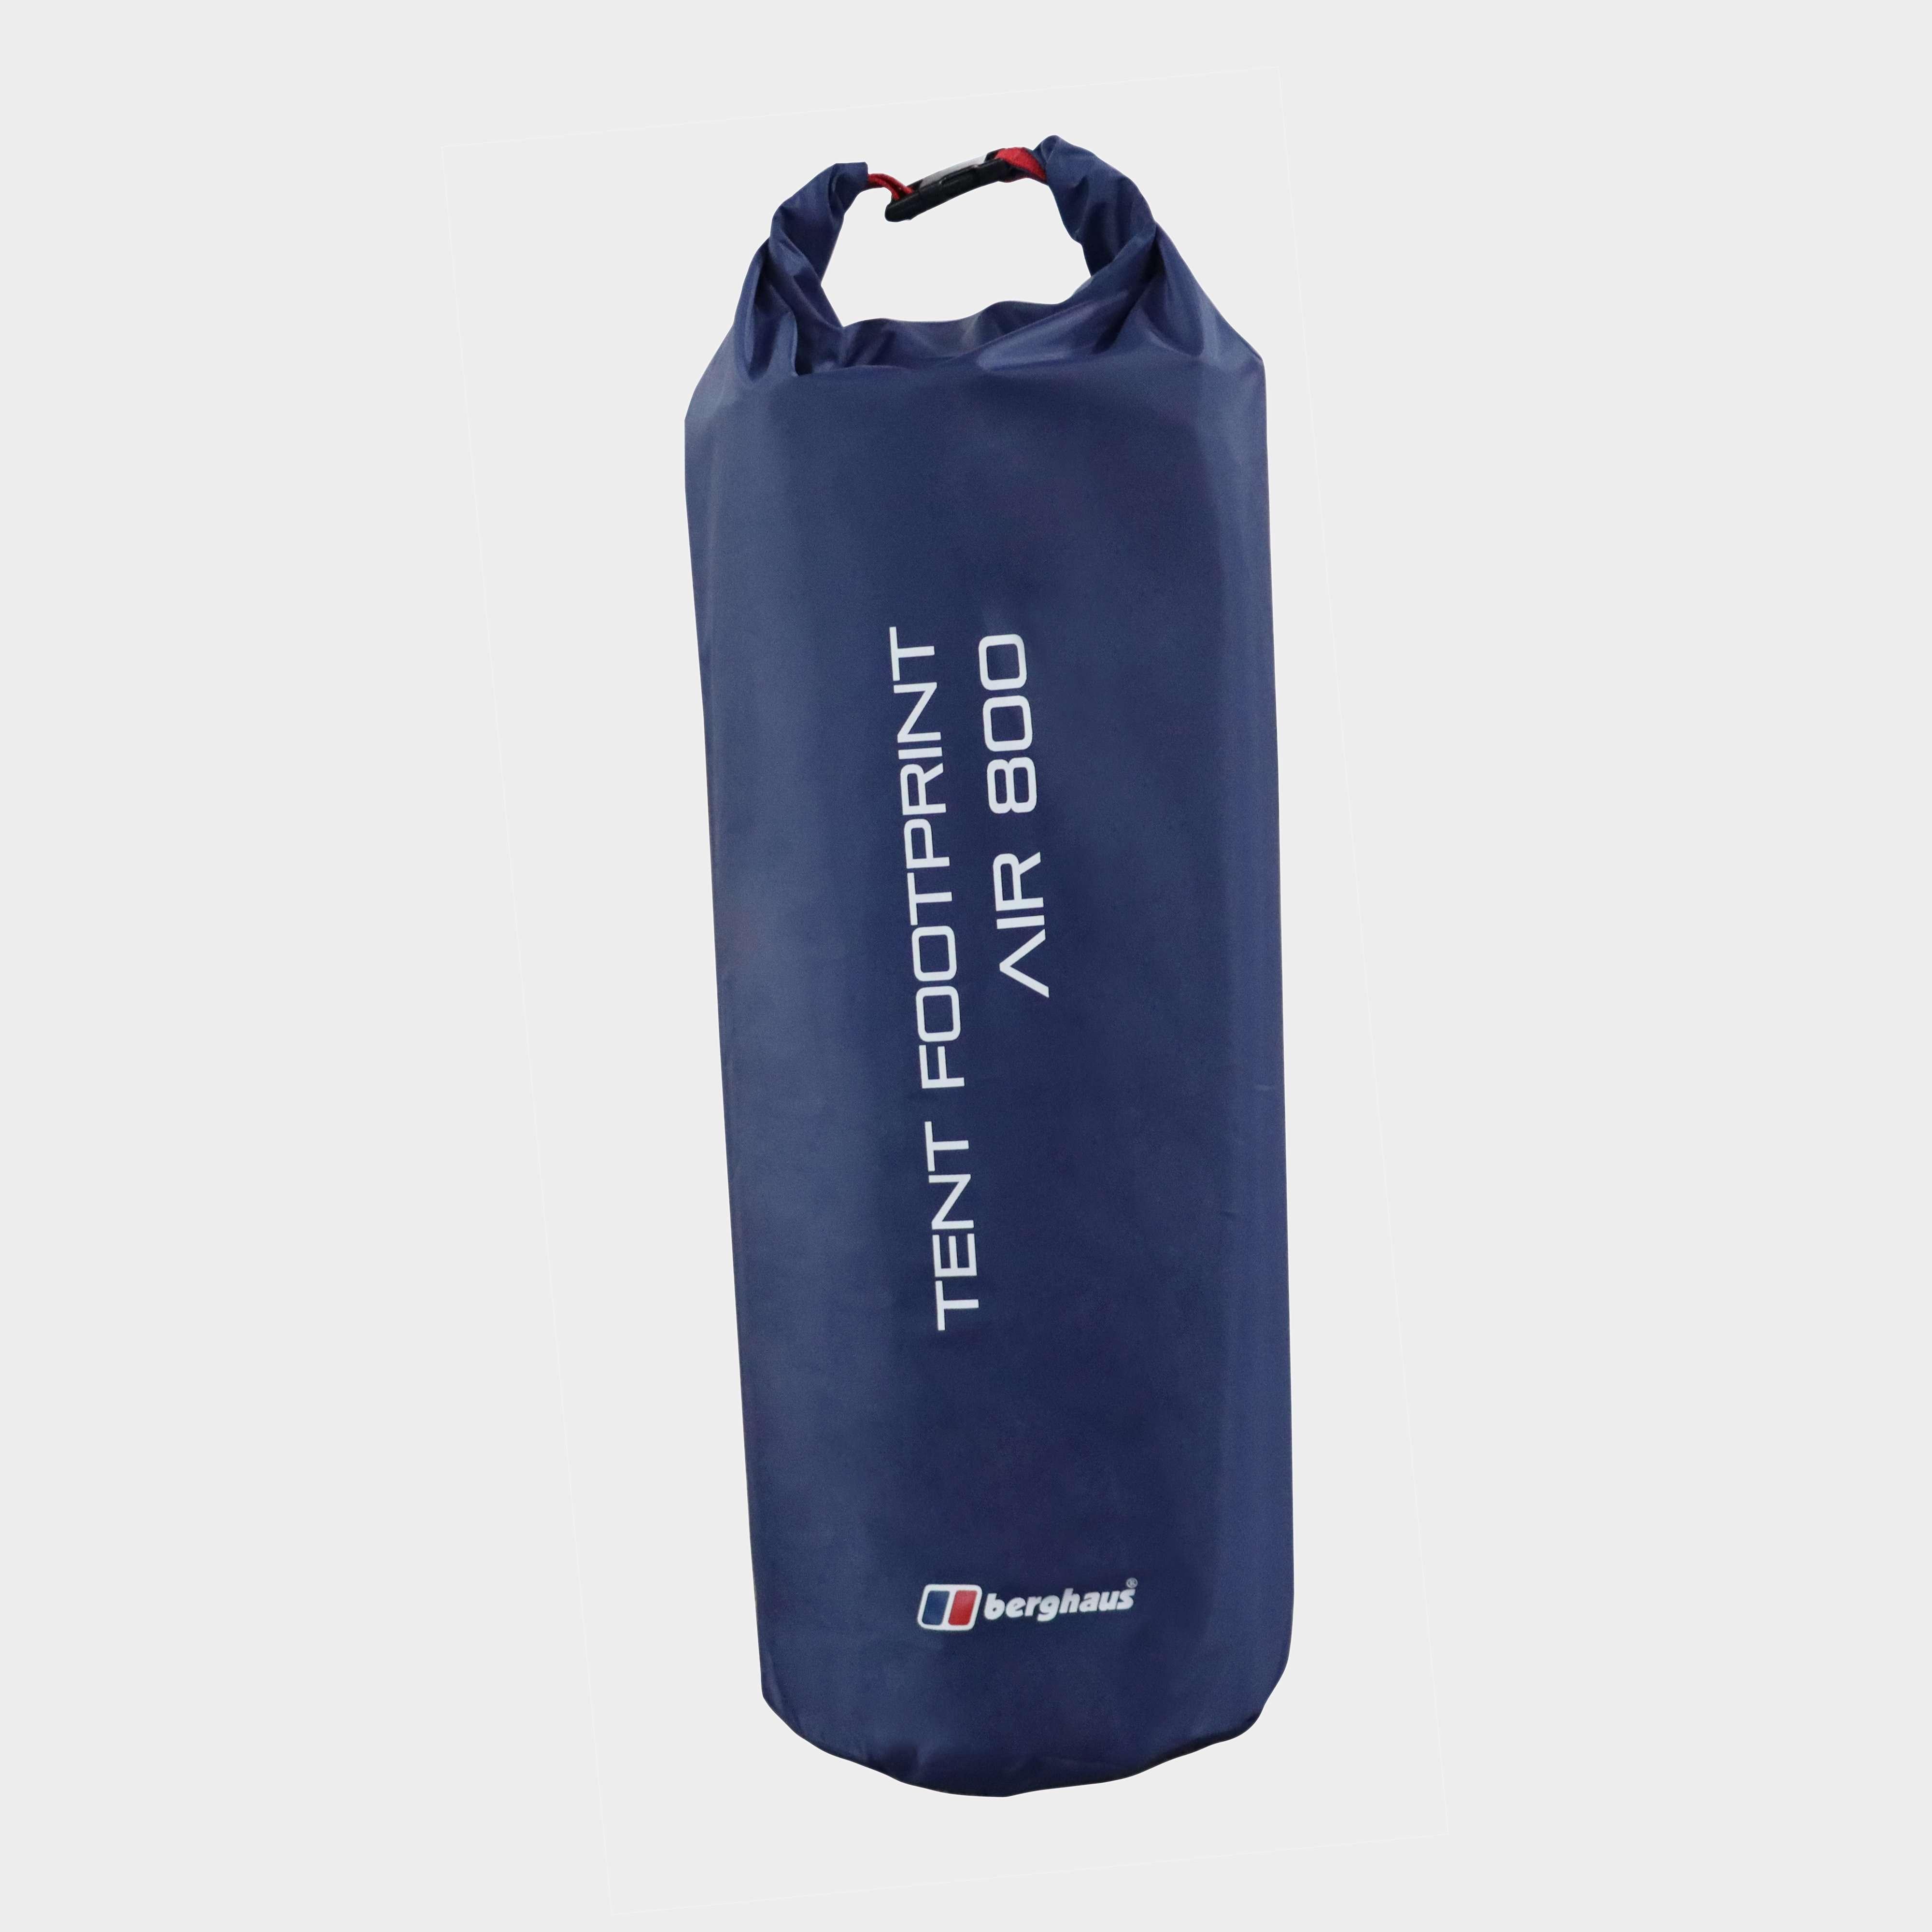 BERGHAUS Air 8 Tent Footprint